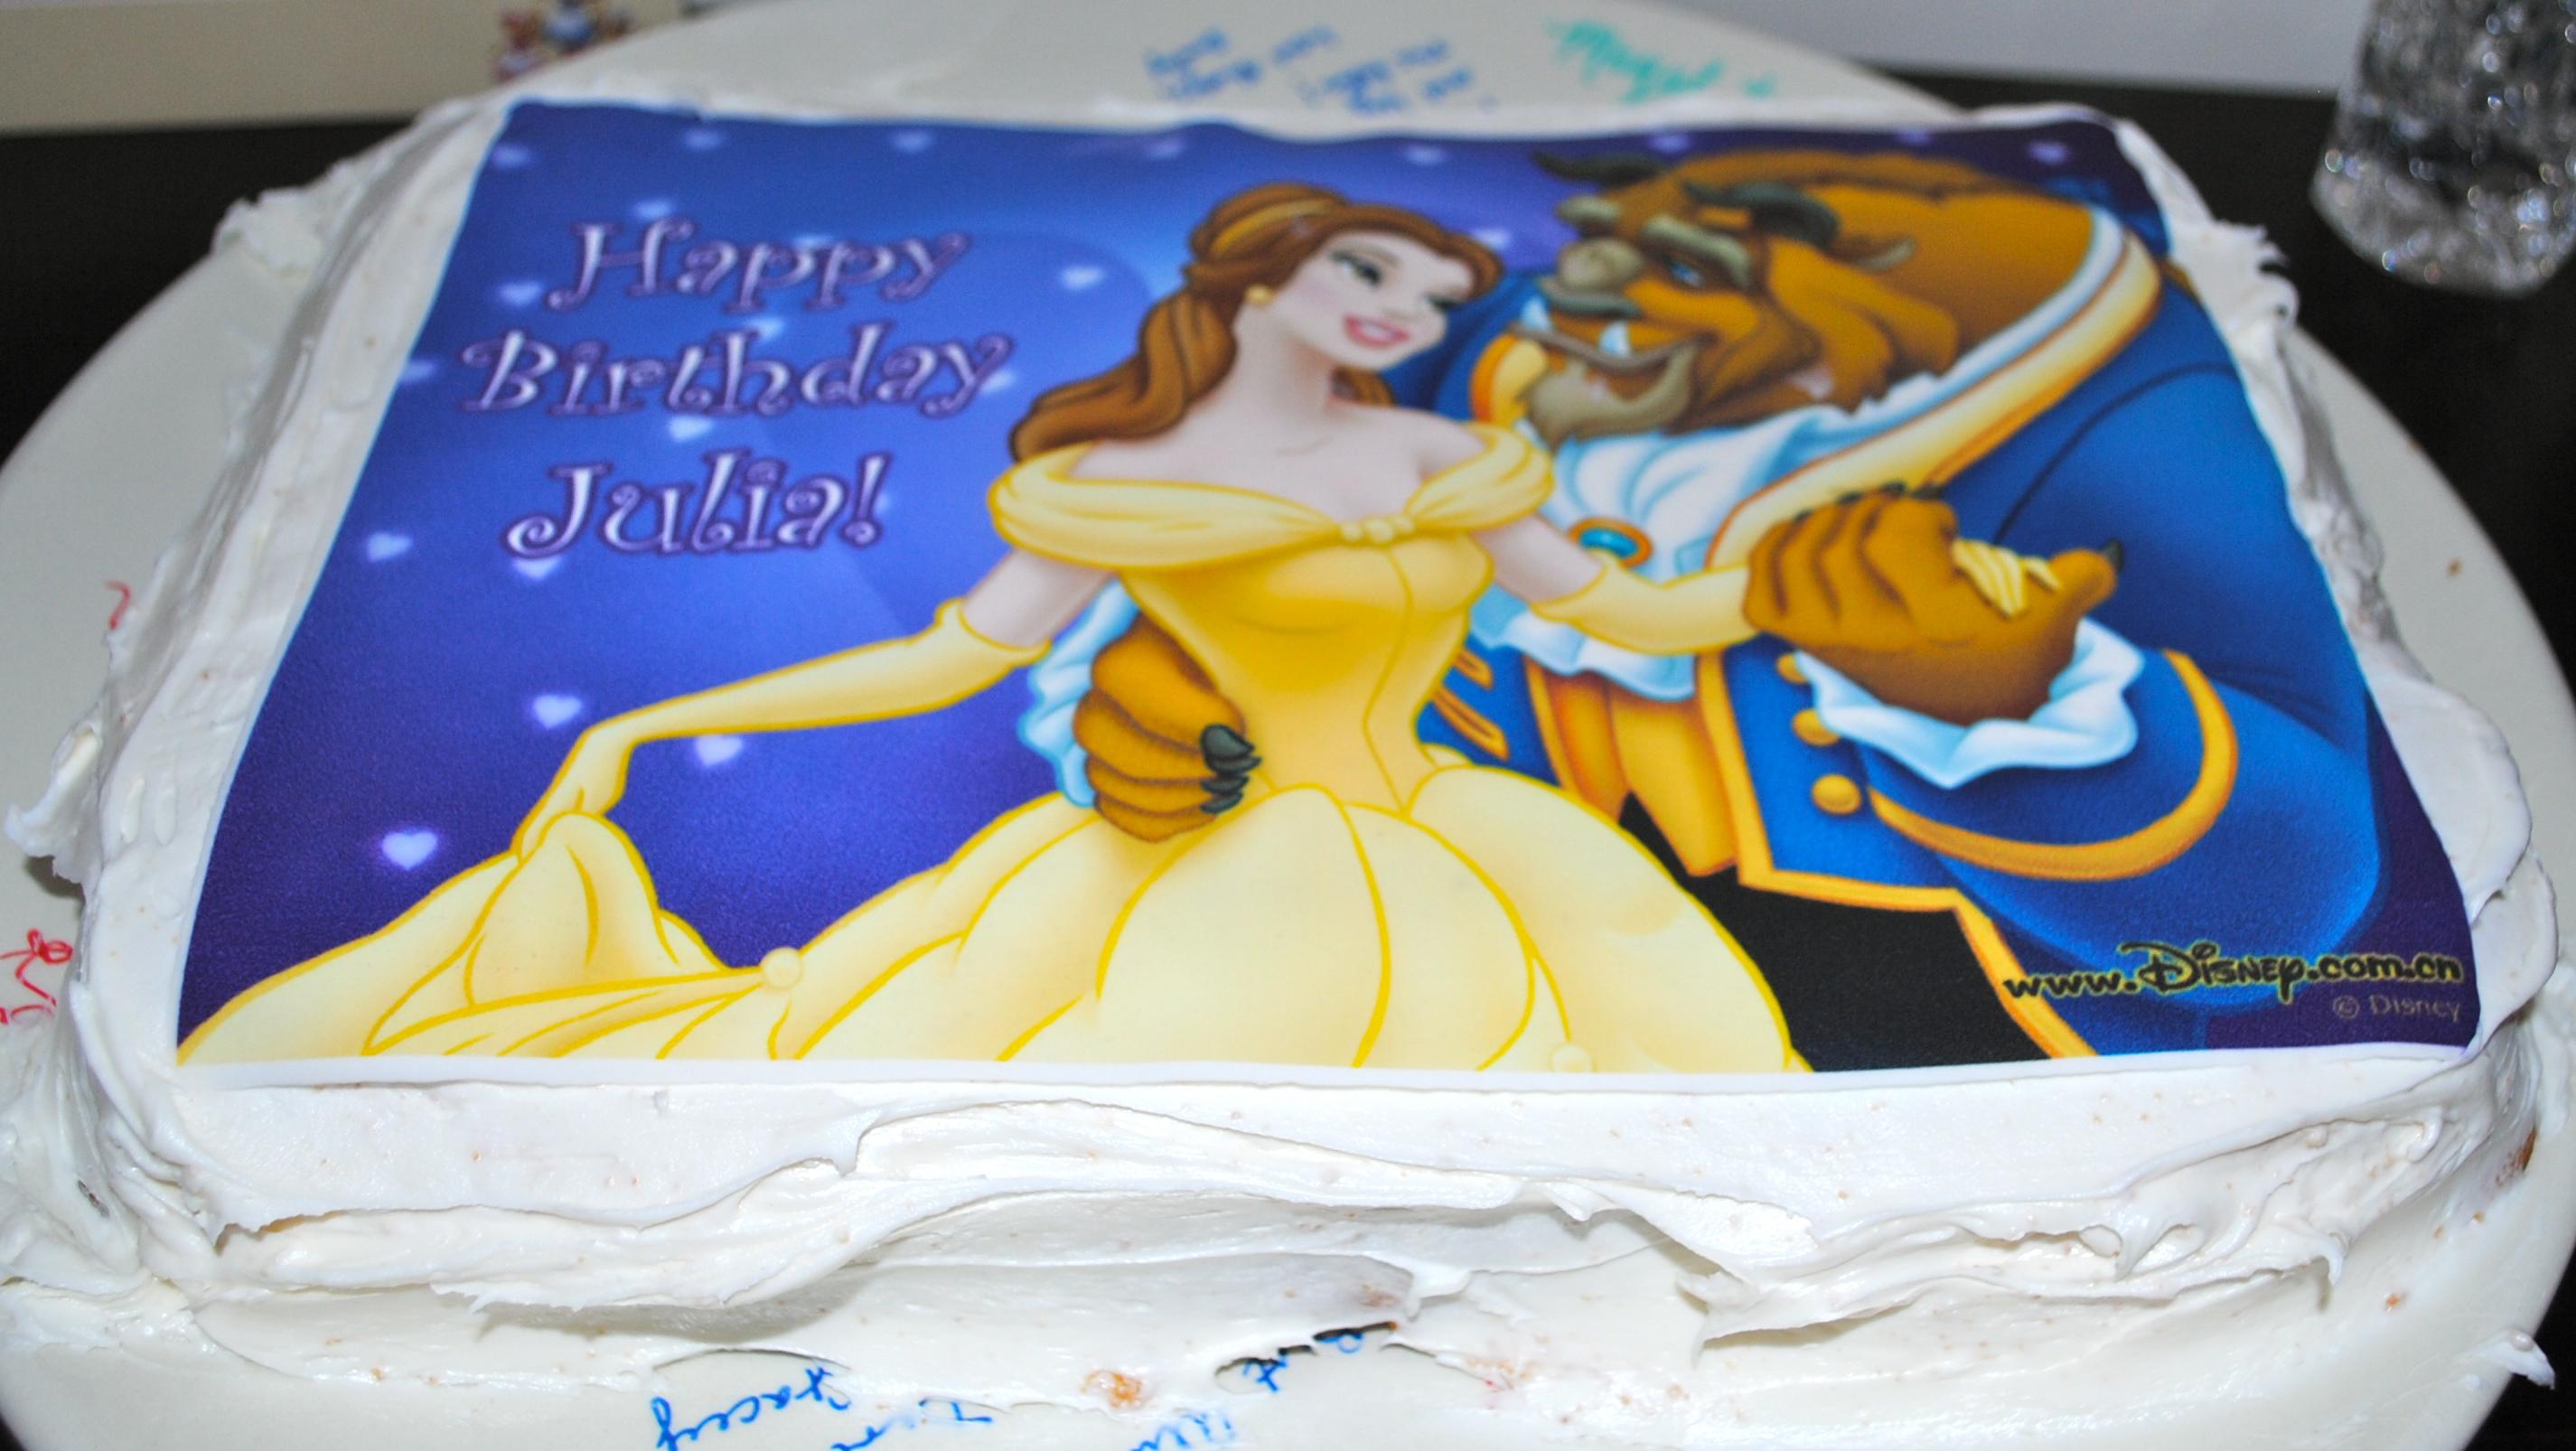 Frozen Movie Sheet Cake I made my cake,